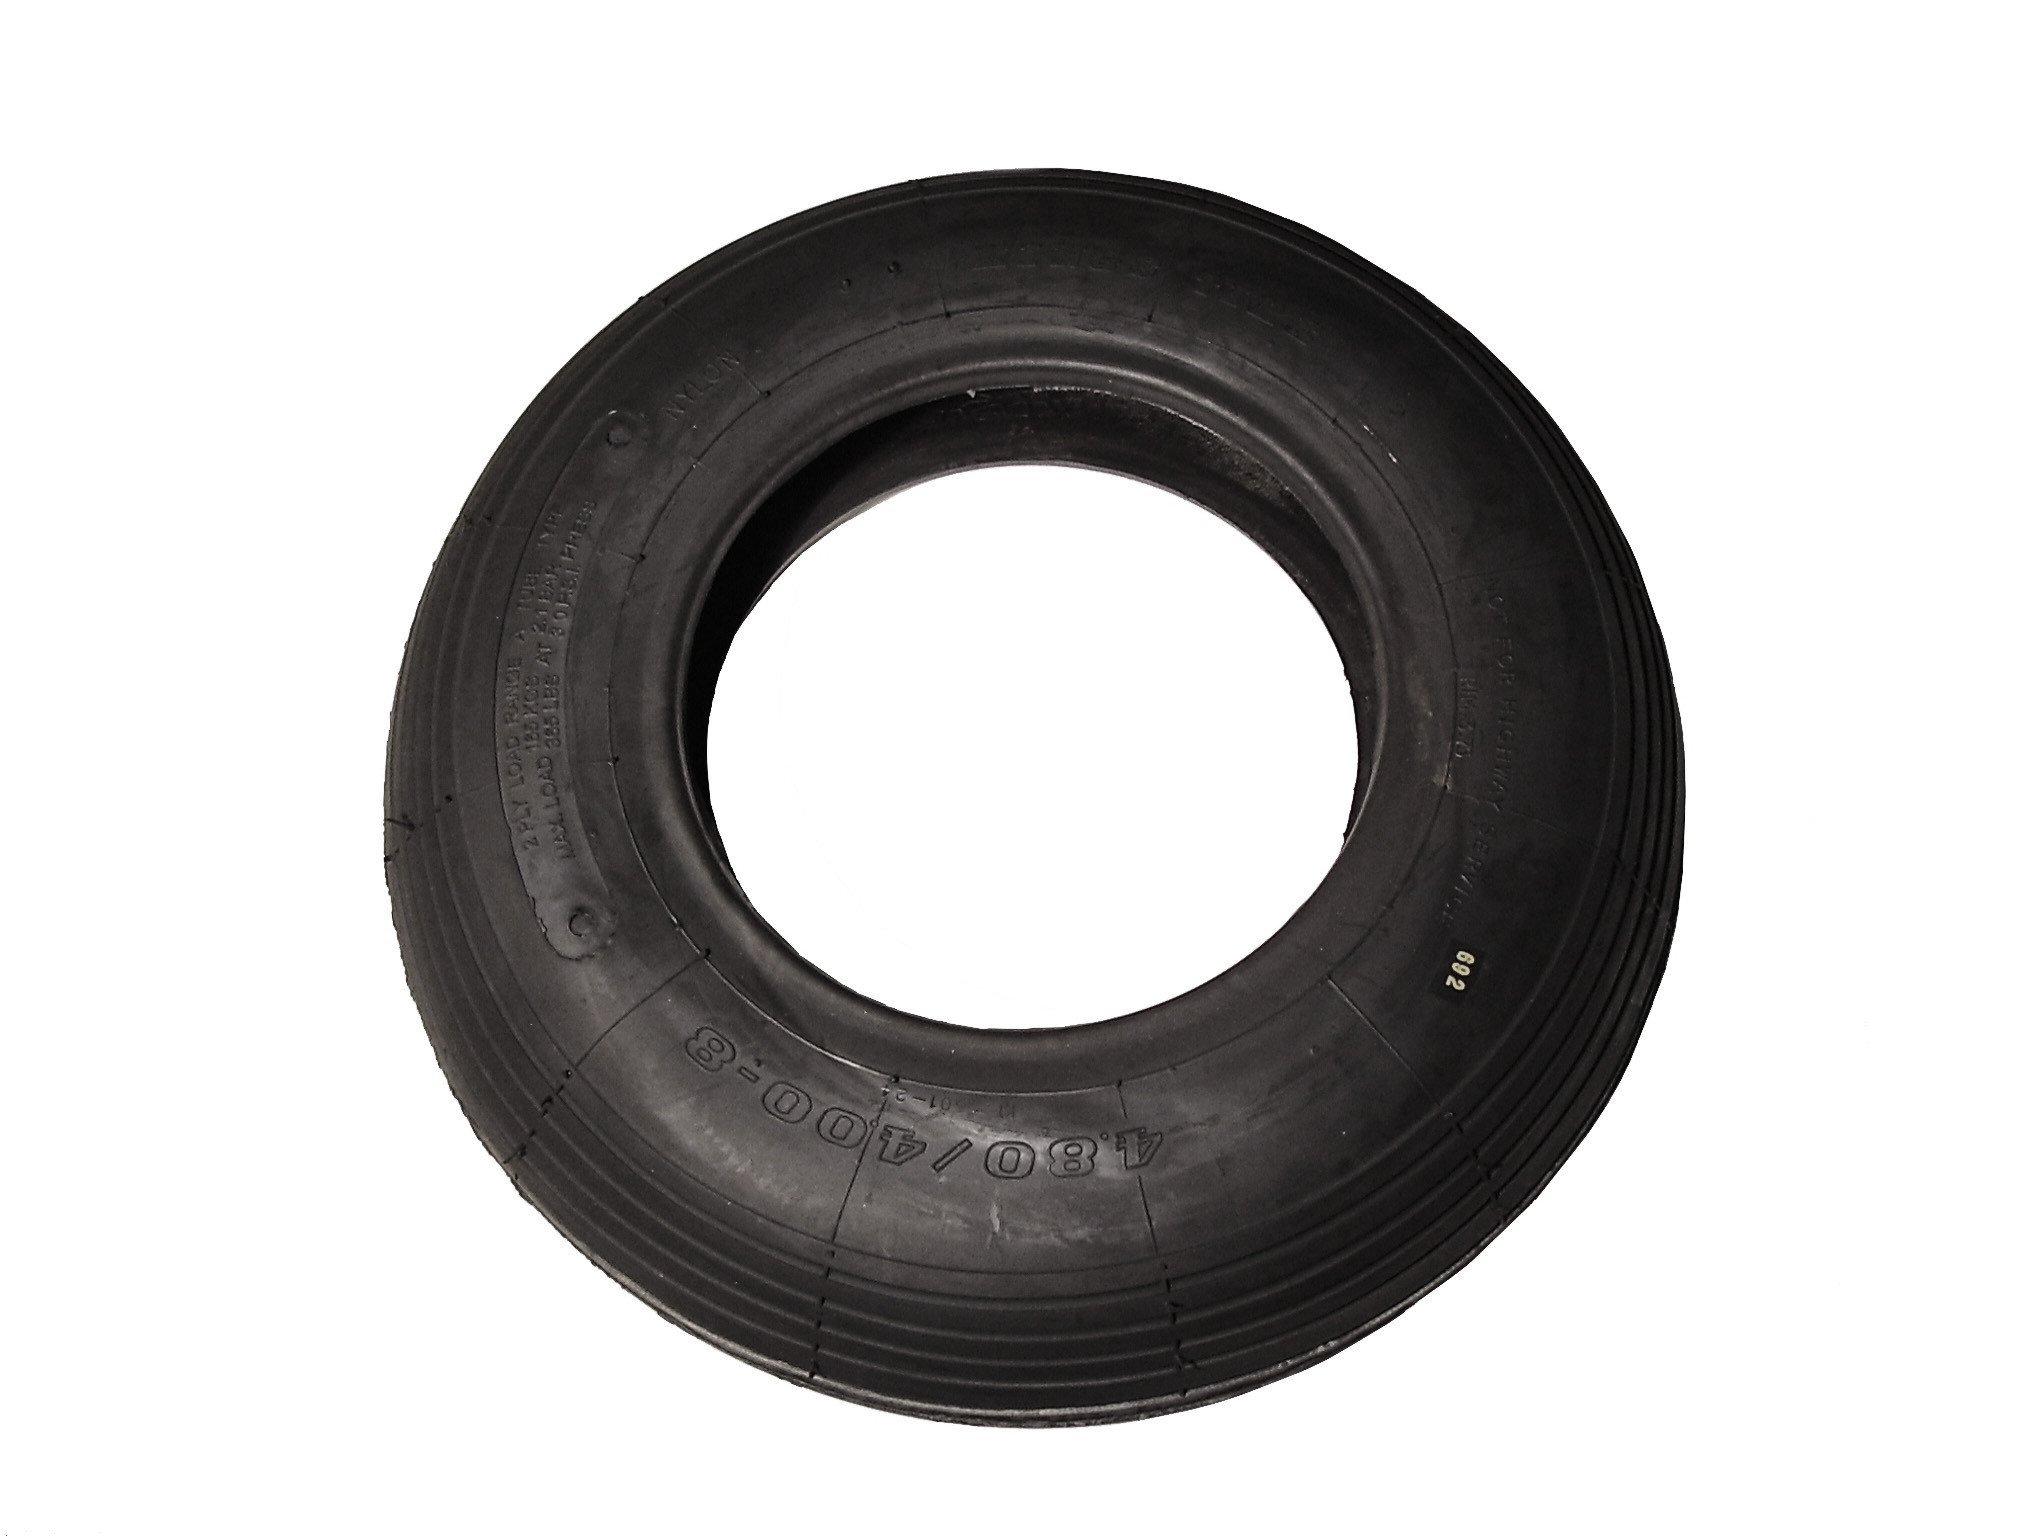 Pneu pour roue de brouette Ø400